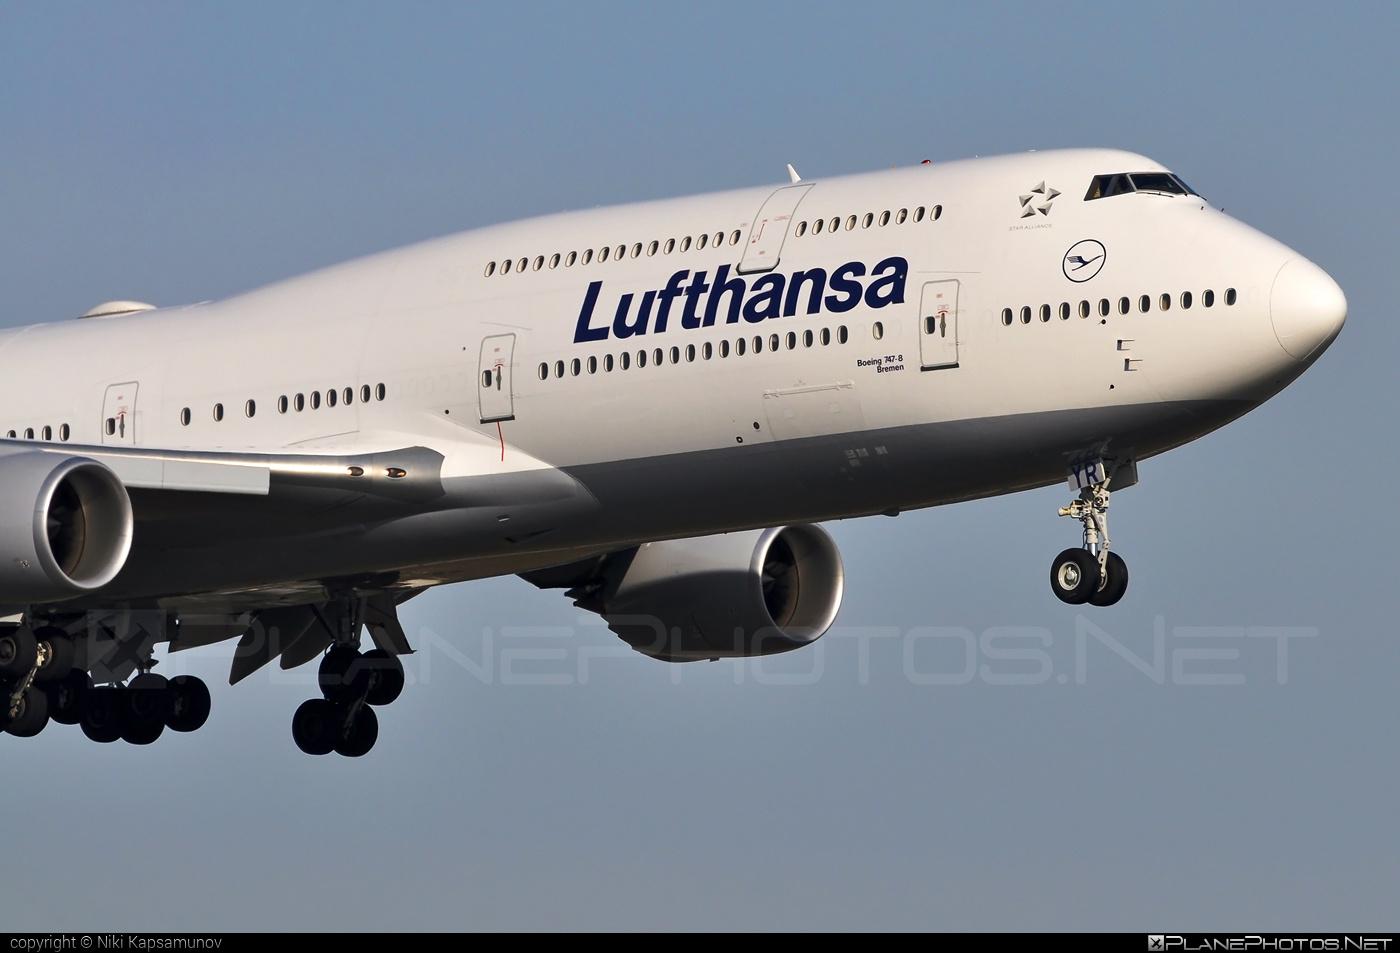 Boeing 747-8 - D-ABYR operated by Lufthansa #b747 #boeing #boeing747 #jumbo #lufthansa